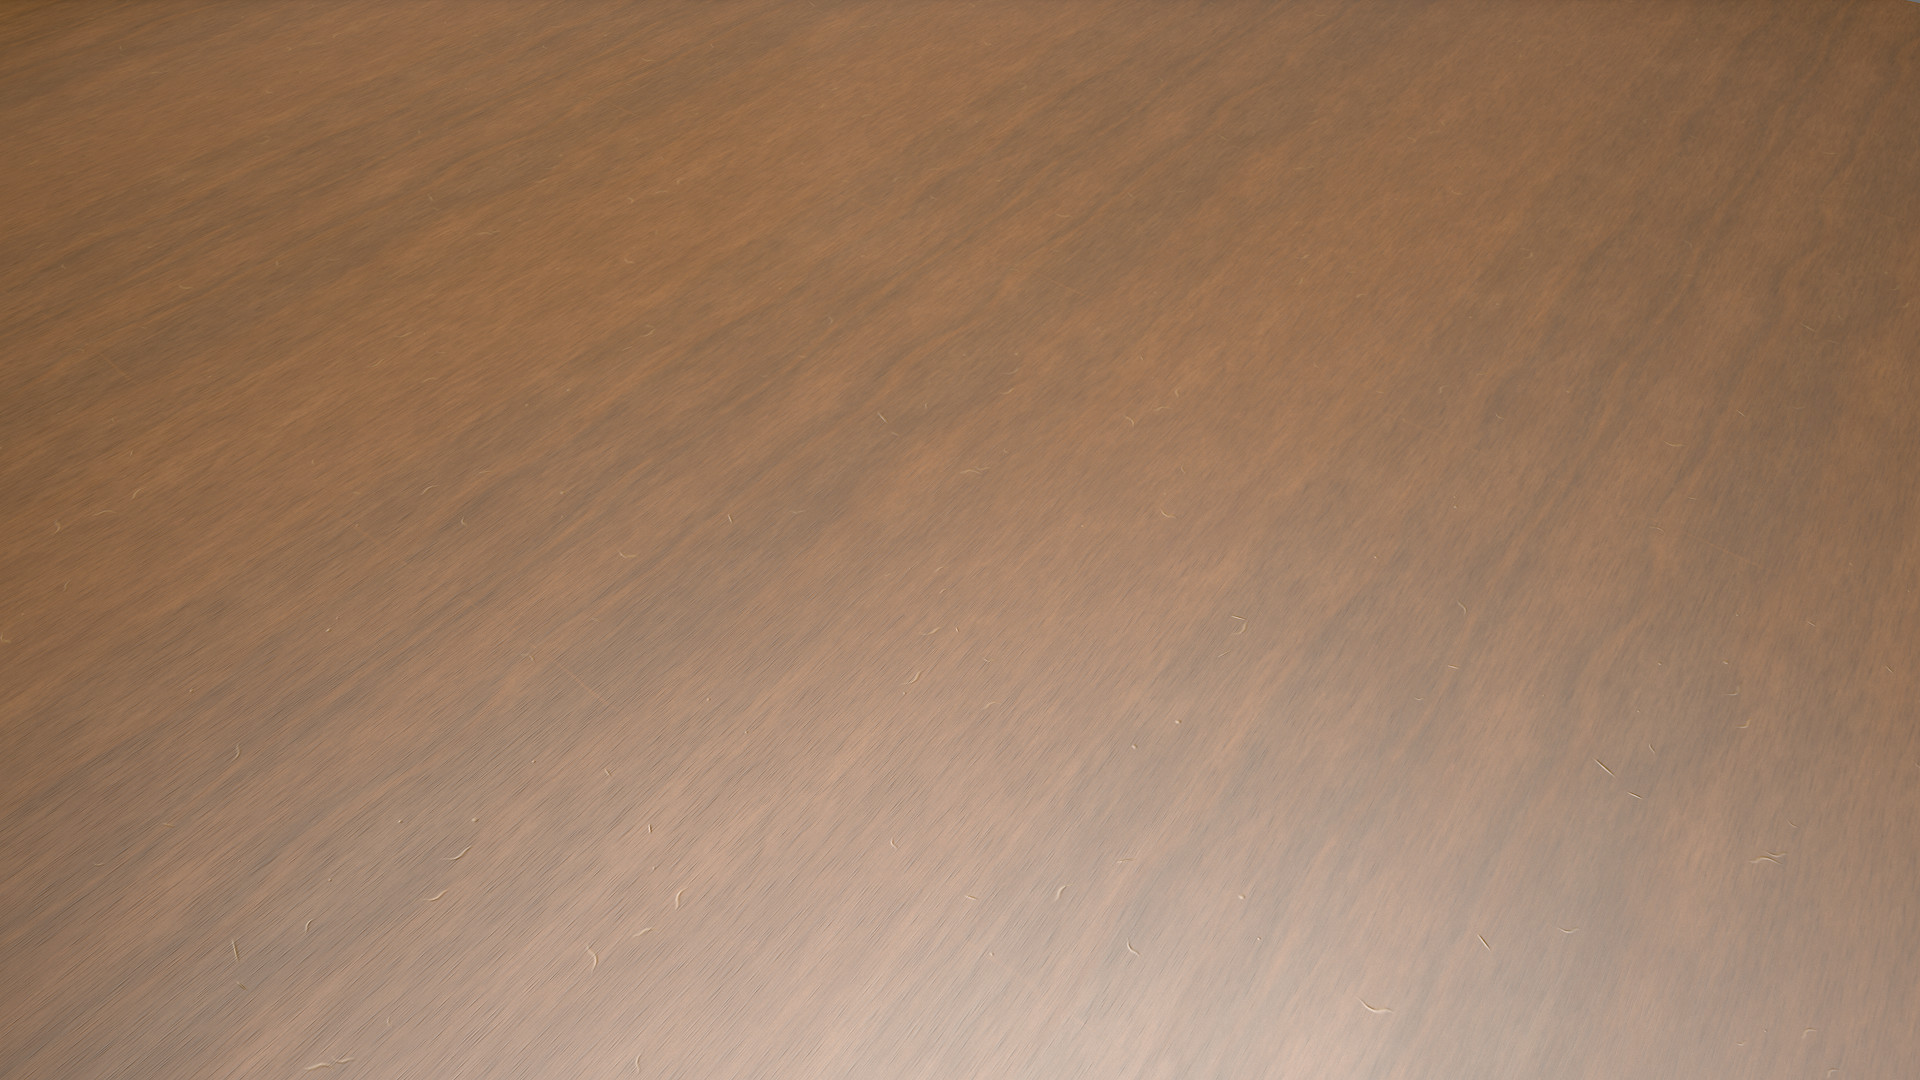 Christoffer sjostrom woodmat